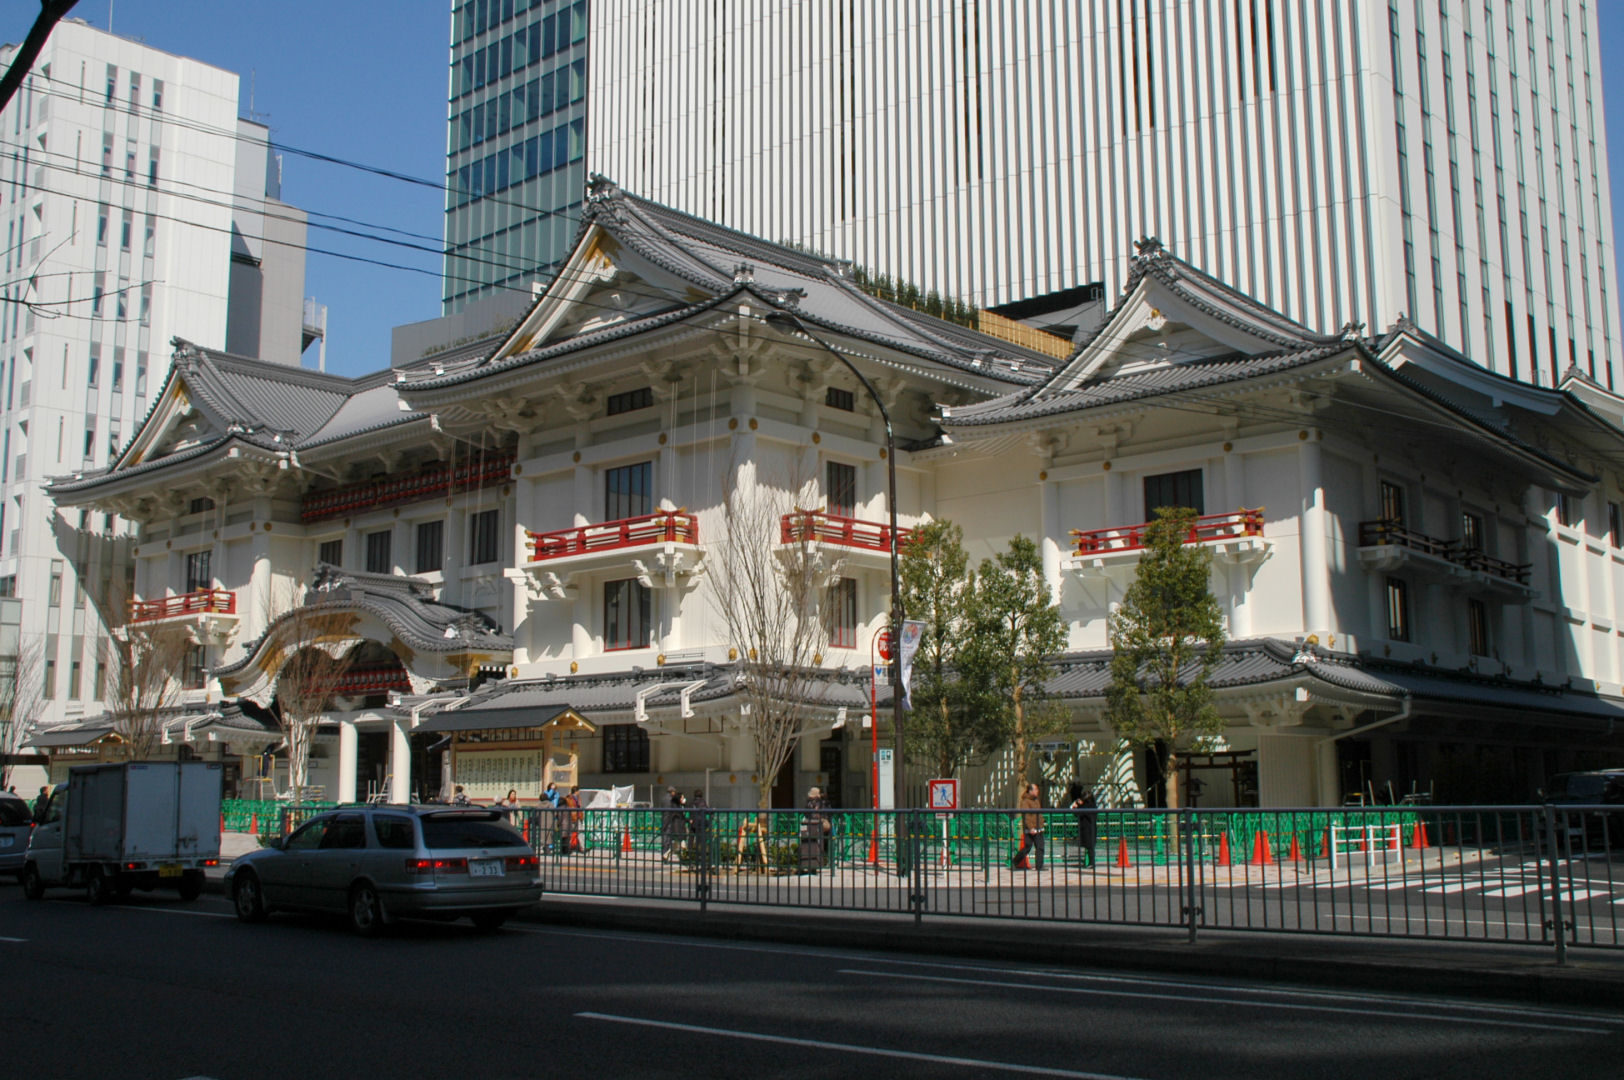 kabukiza13020027e.jpg